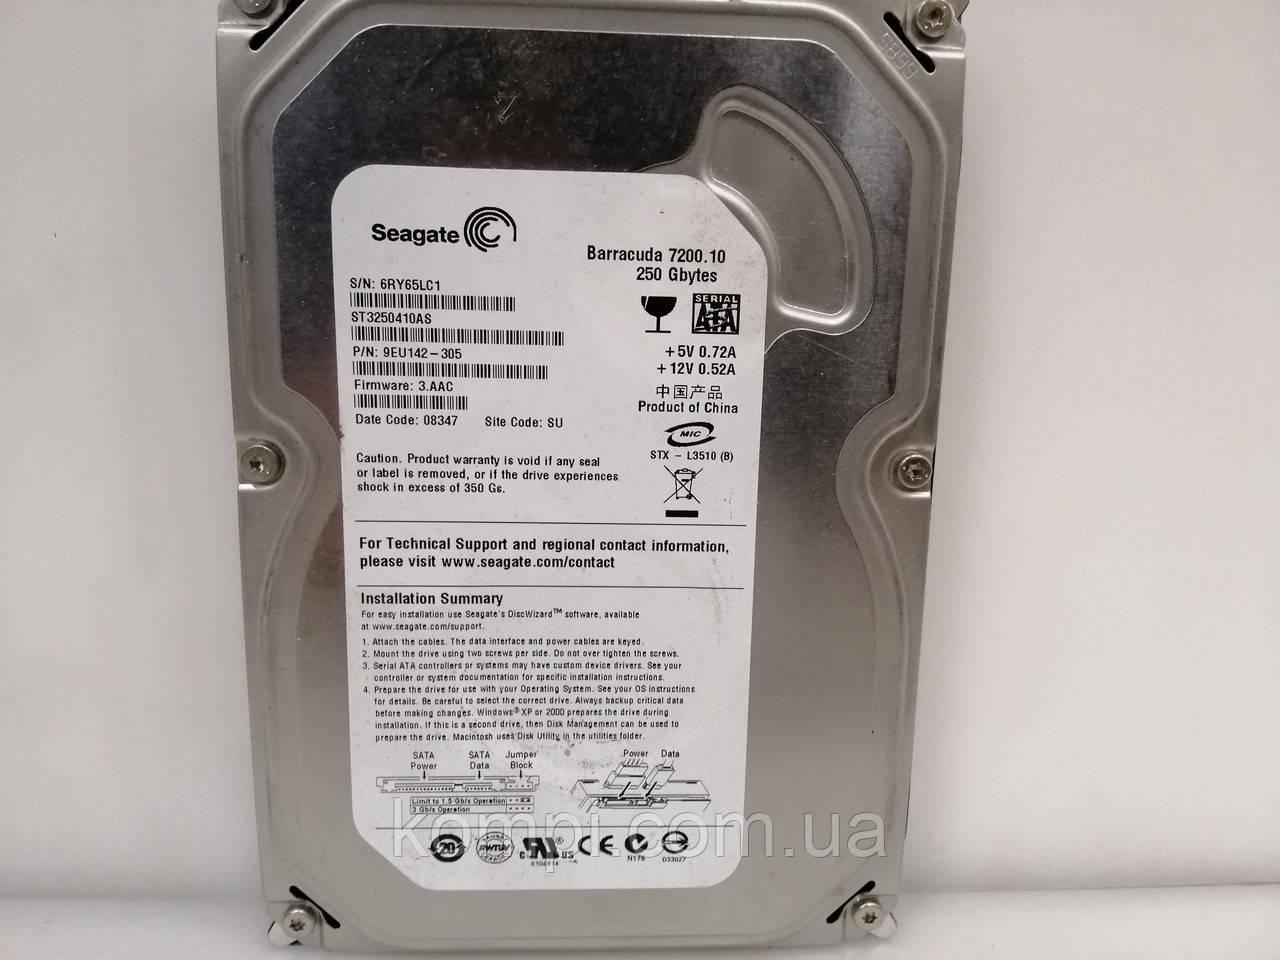 HDD Жорстку диск Seagate Barracuda 7200.10 250GB 7200rpm 16MB 3.5 SATA II для ПК ІДЕАЛЬНИЙ СТАН